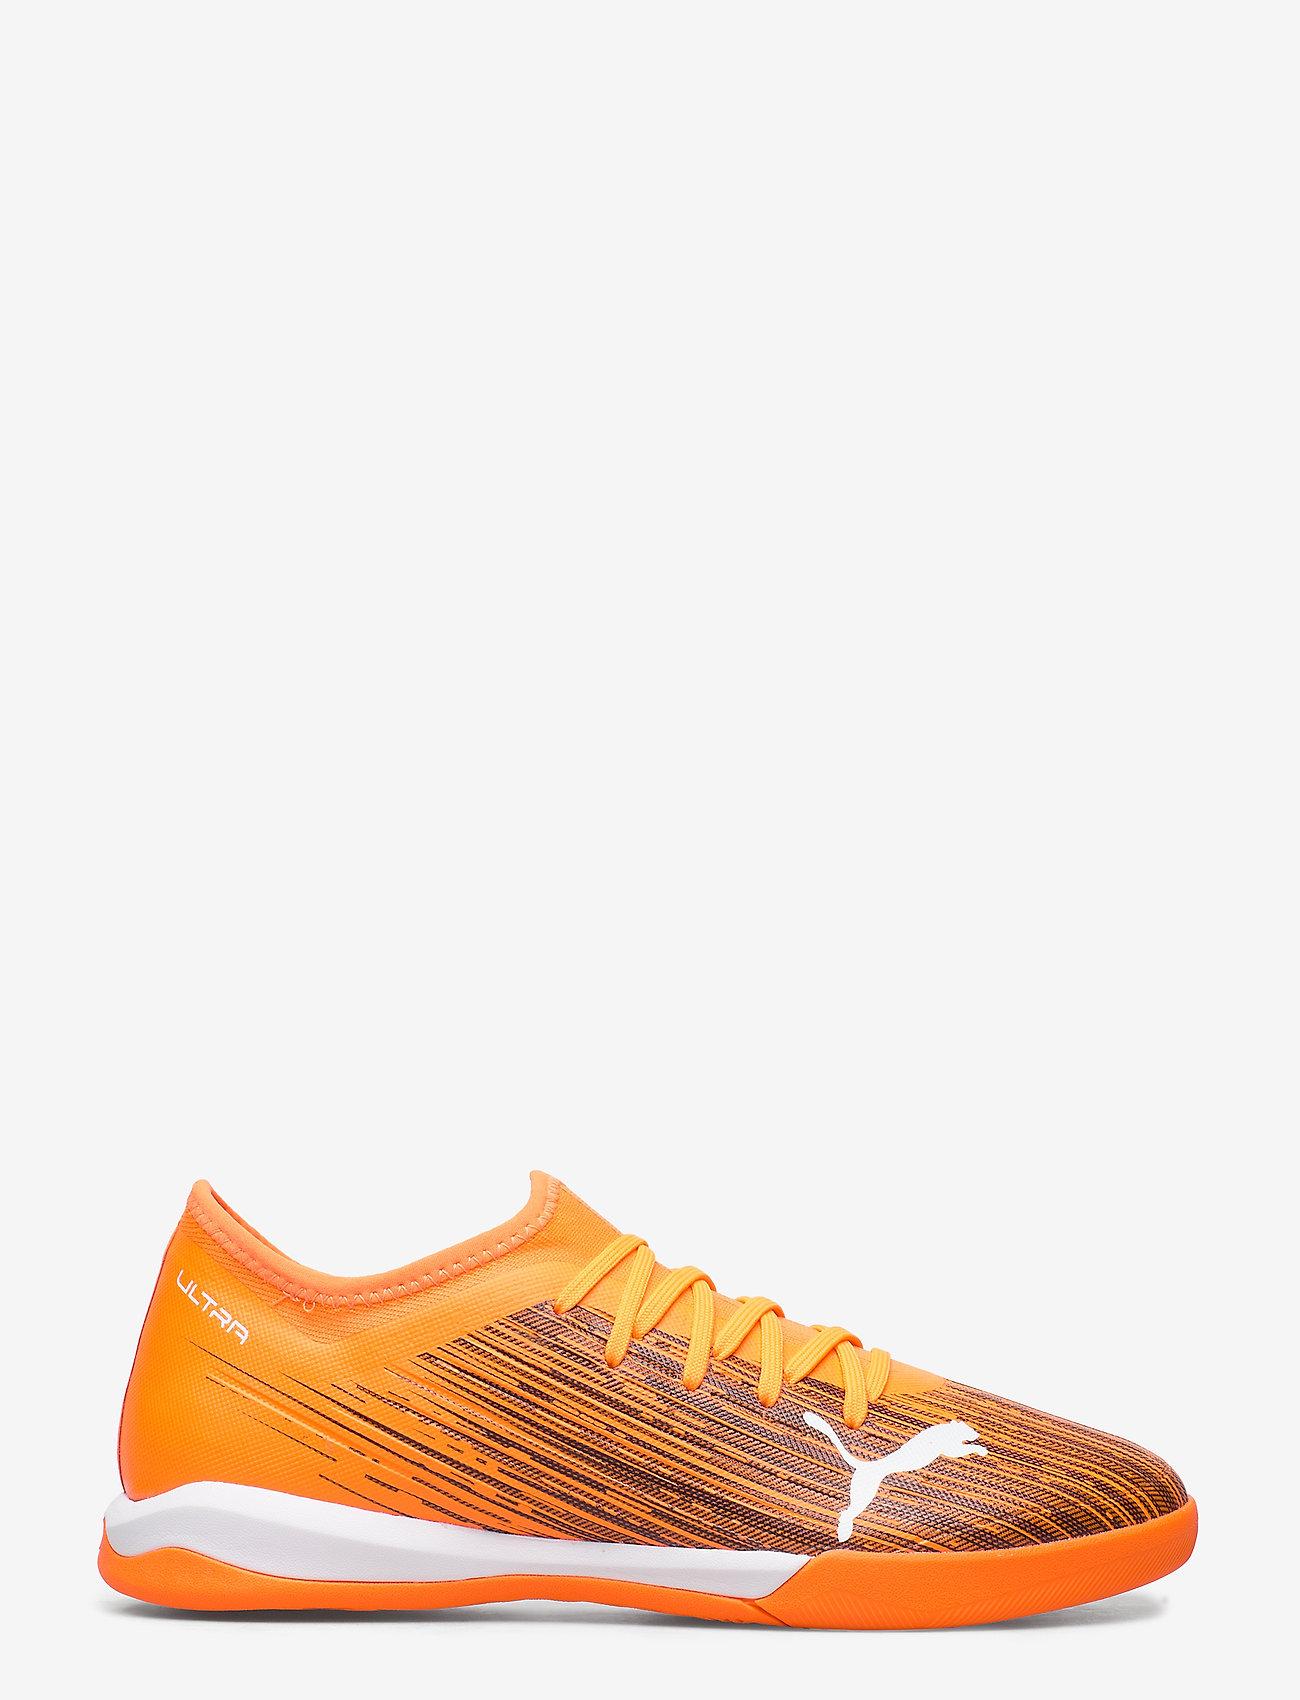 PUMA - ULTRA 3.1 IT - fodboldsko - shocking orange-puma black - 1